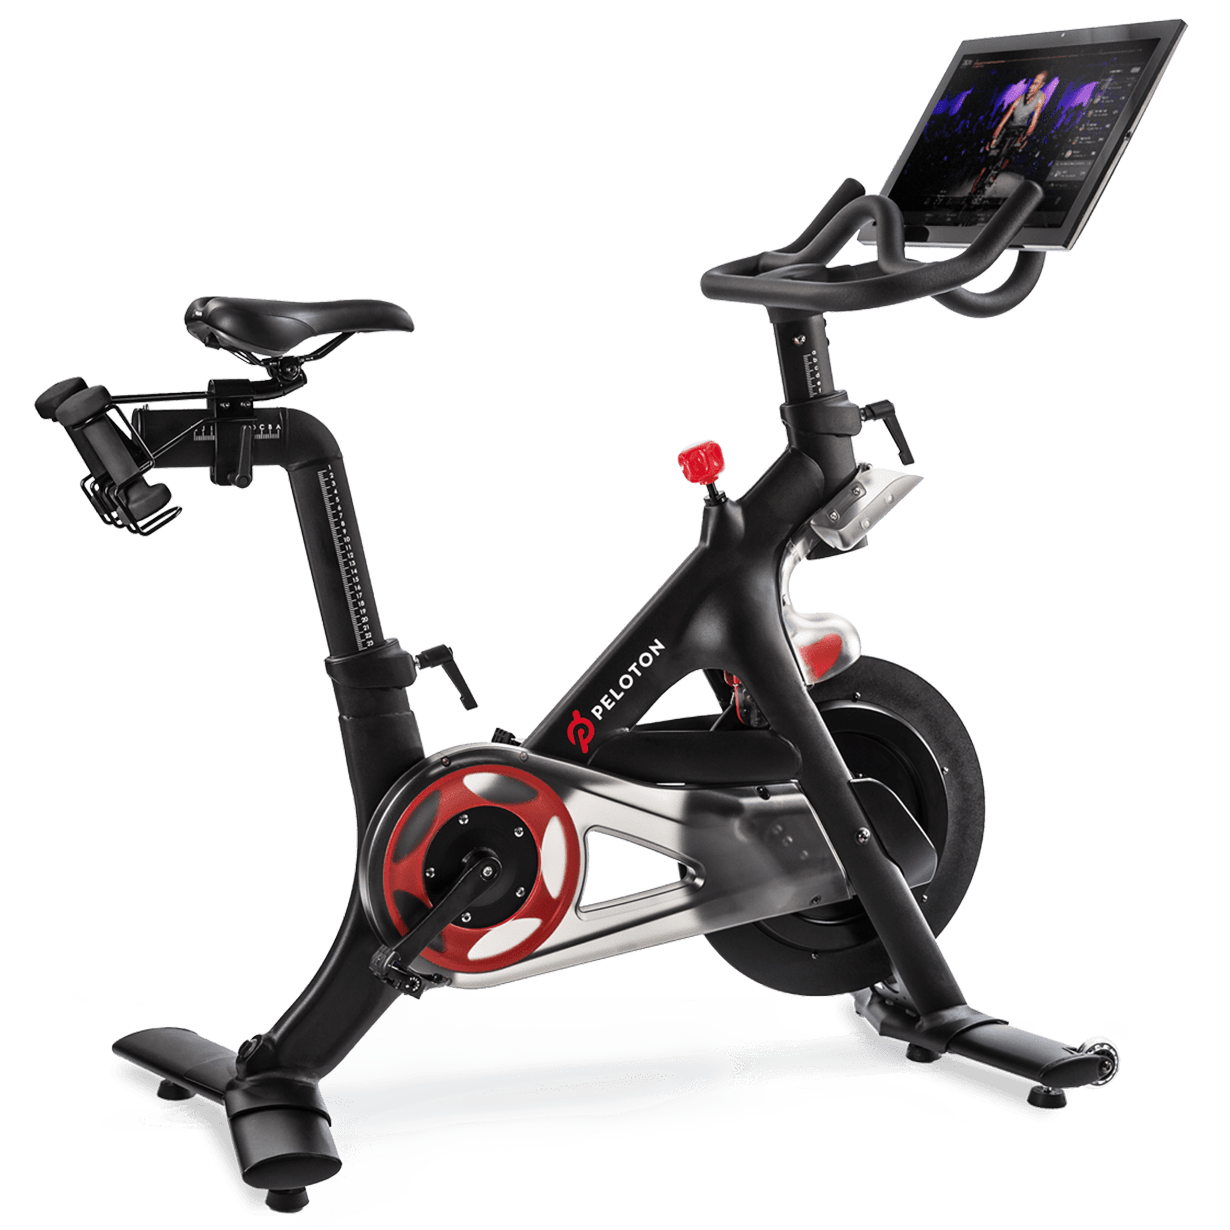 Peloton spin bike